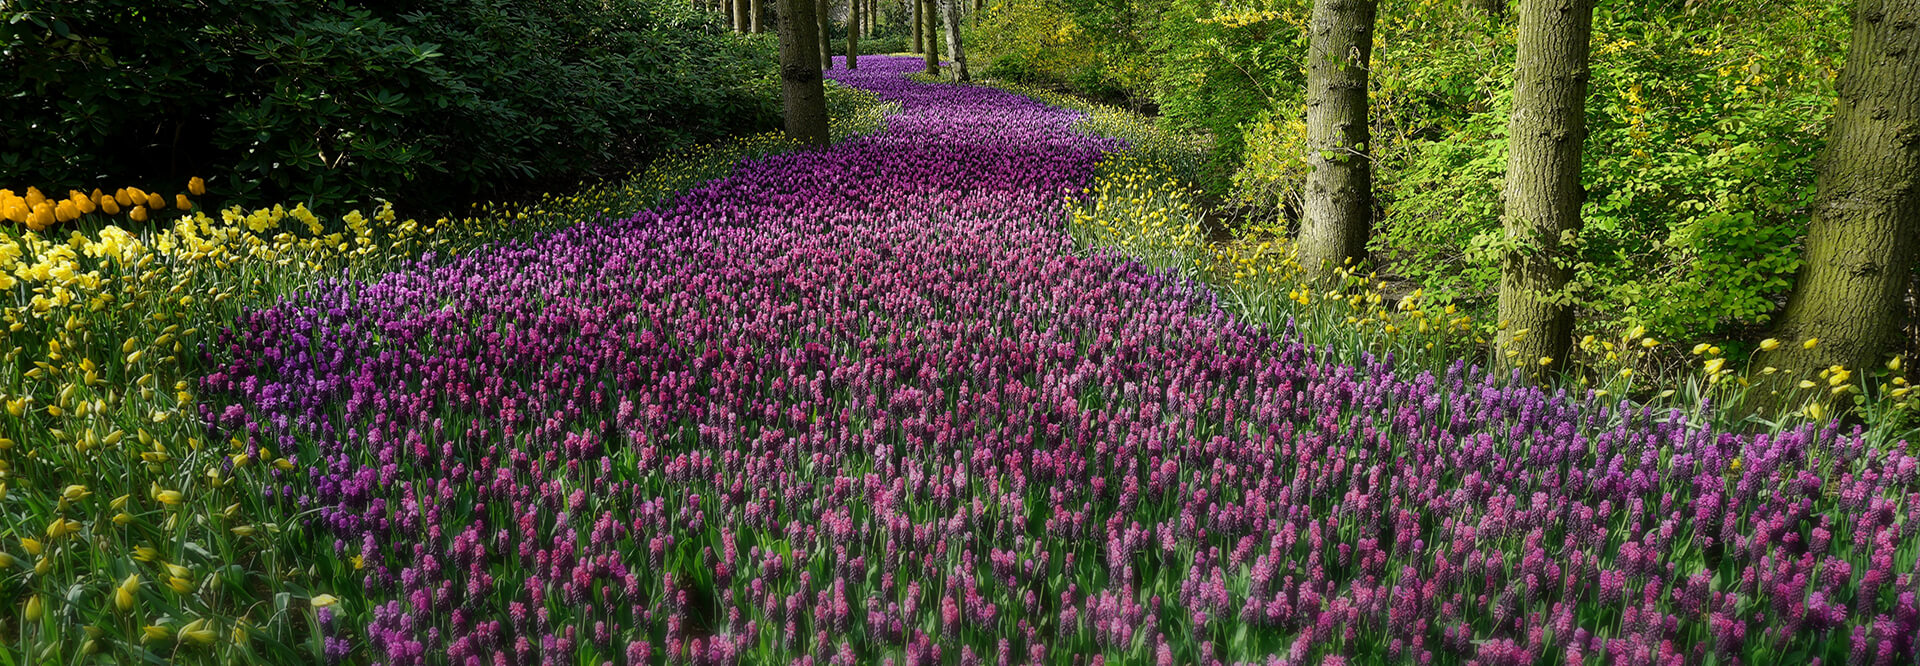 The Compassionate Gardener background